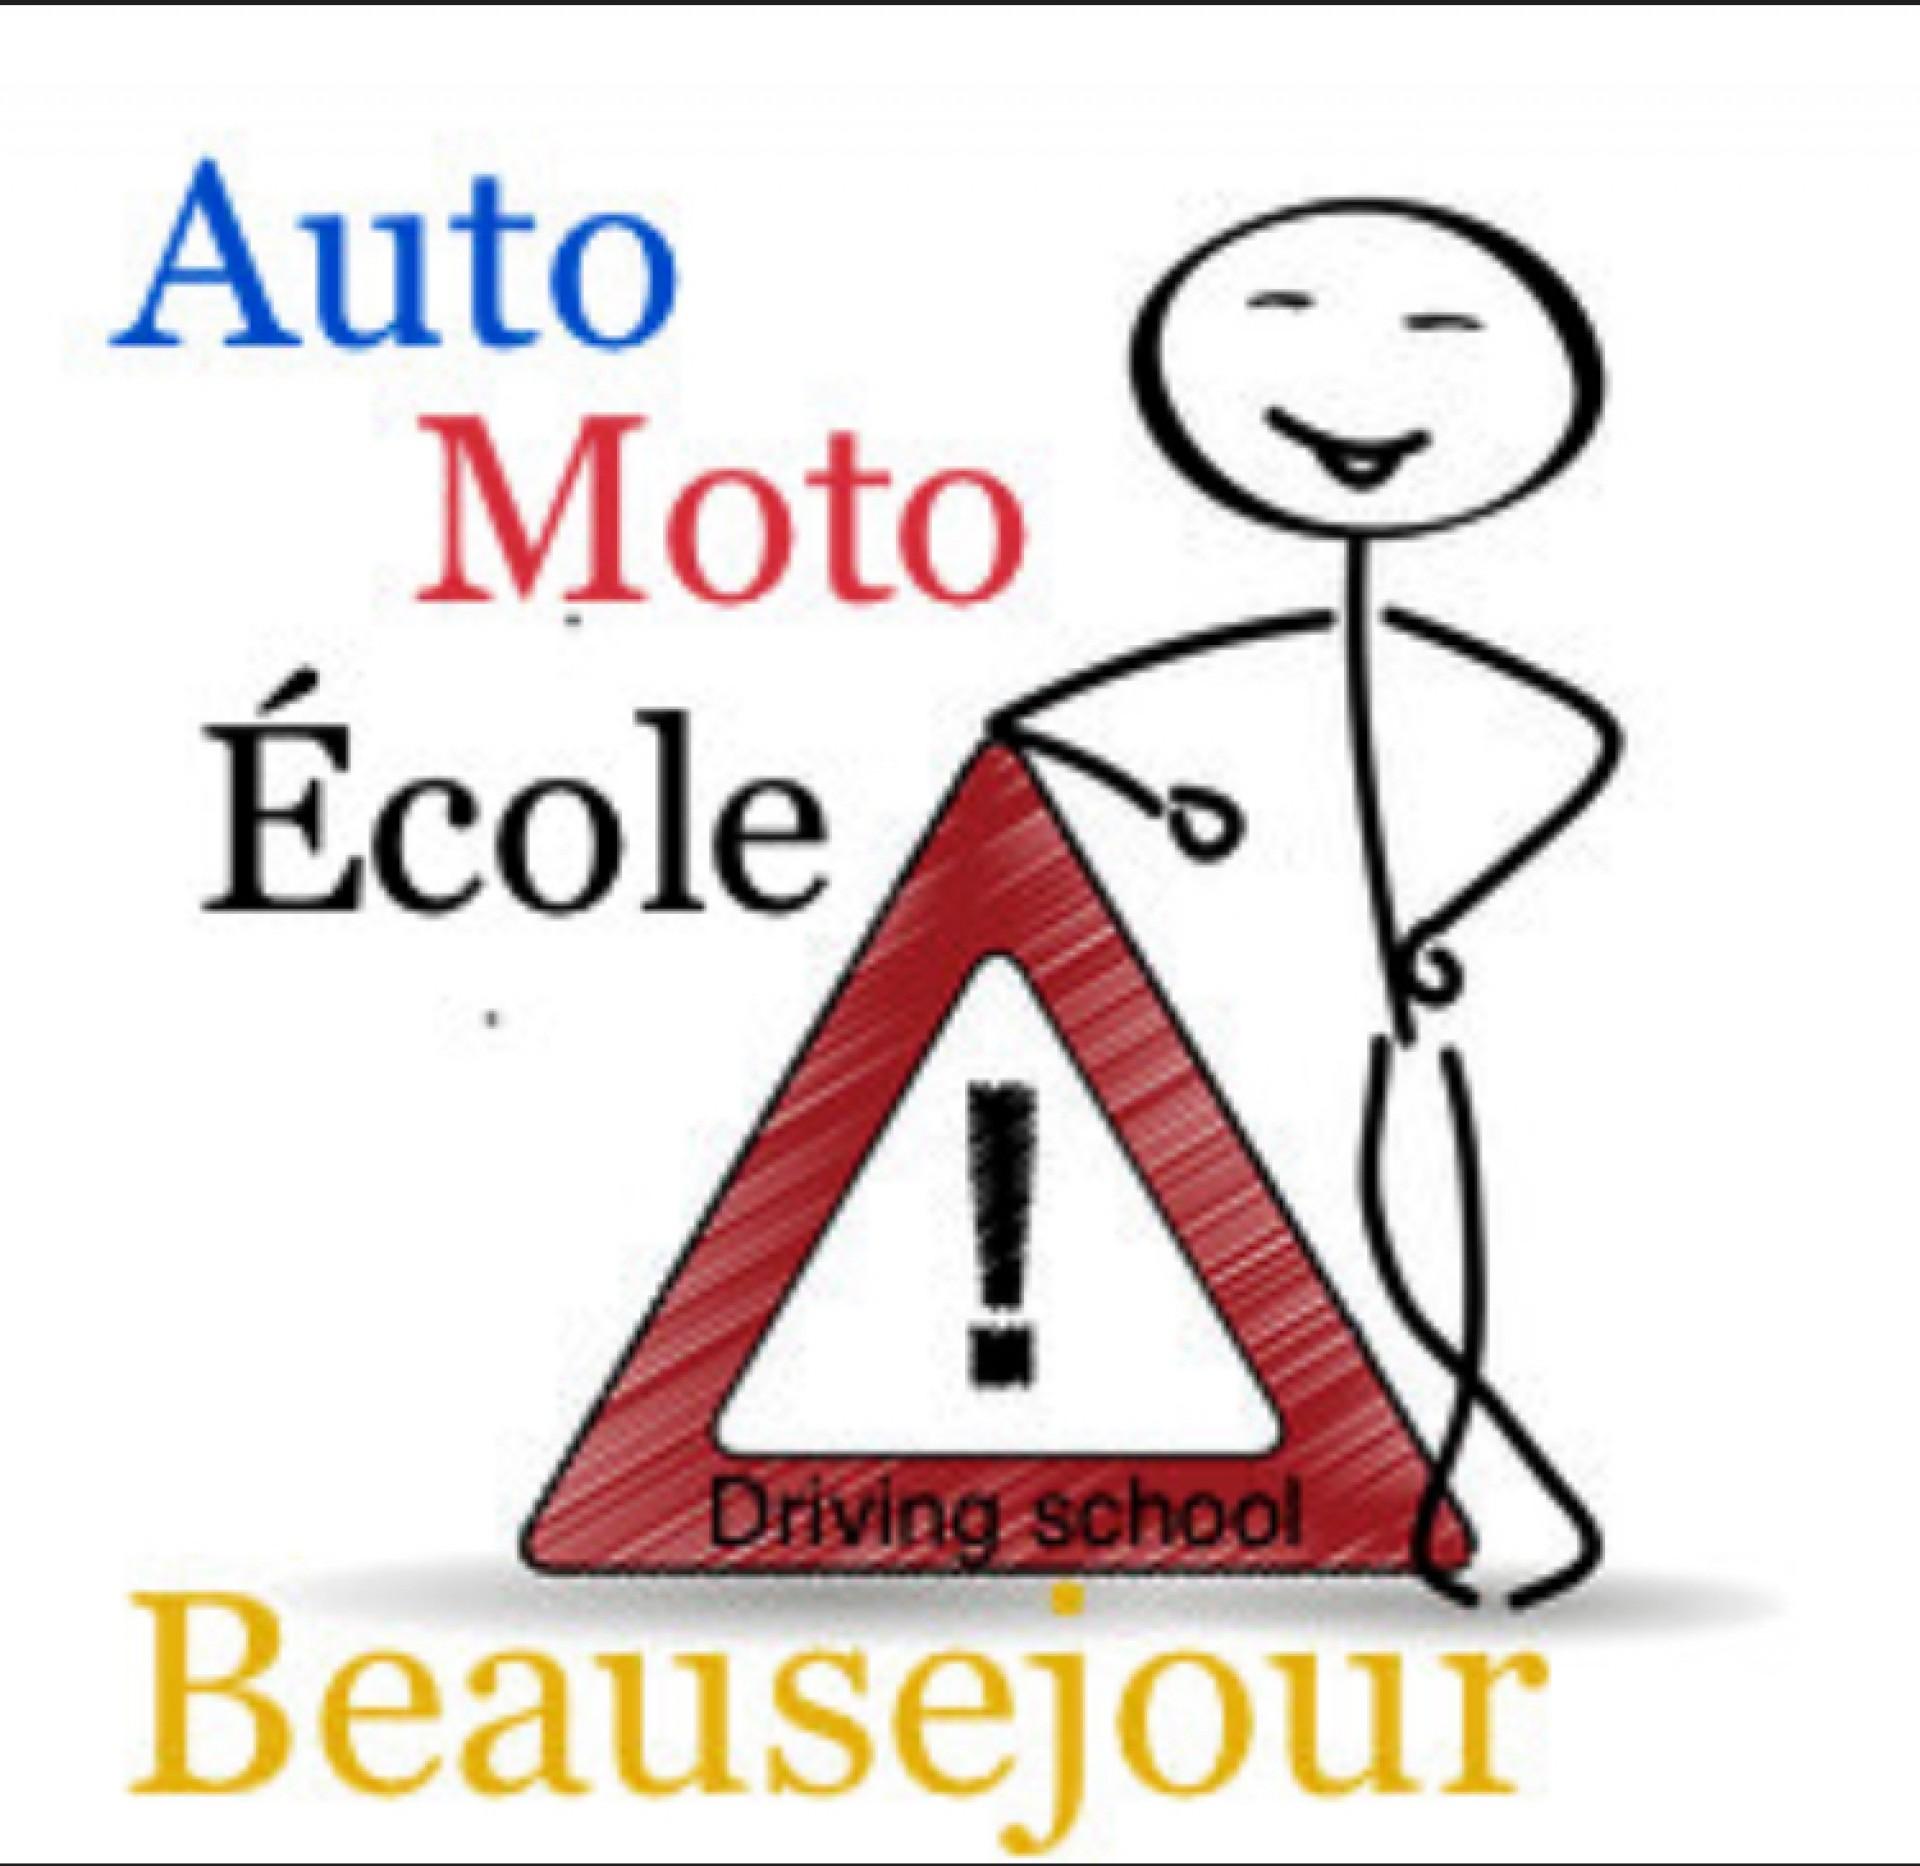 Auto-Moto Ecole Beauséjour logo